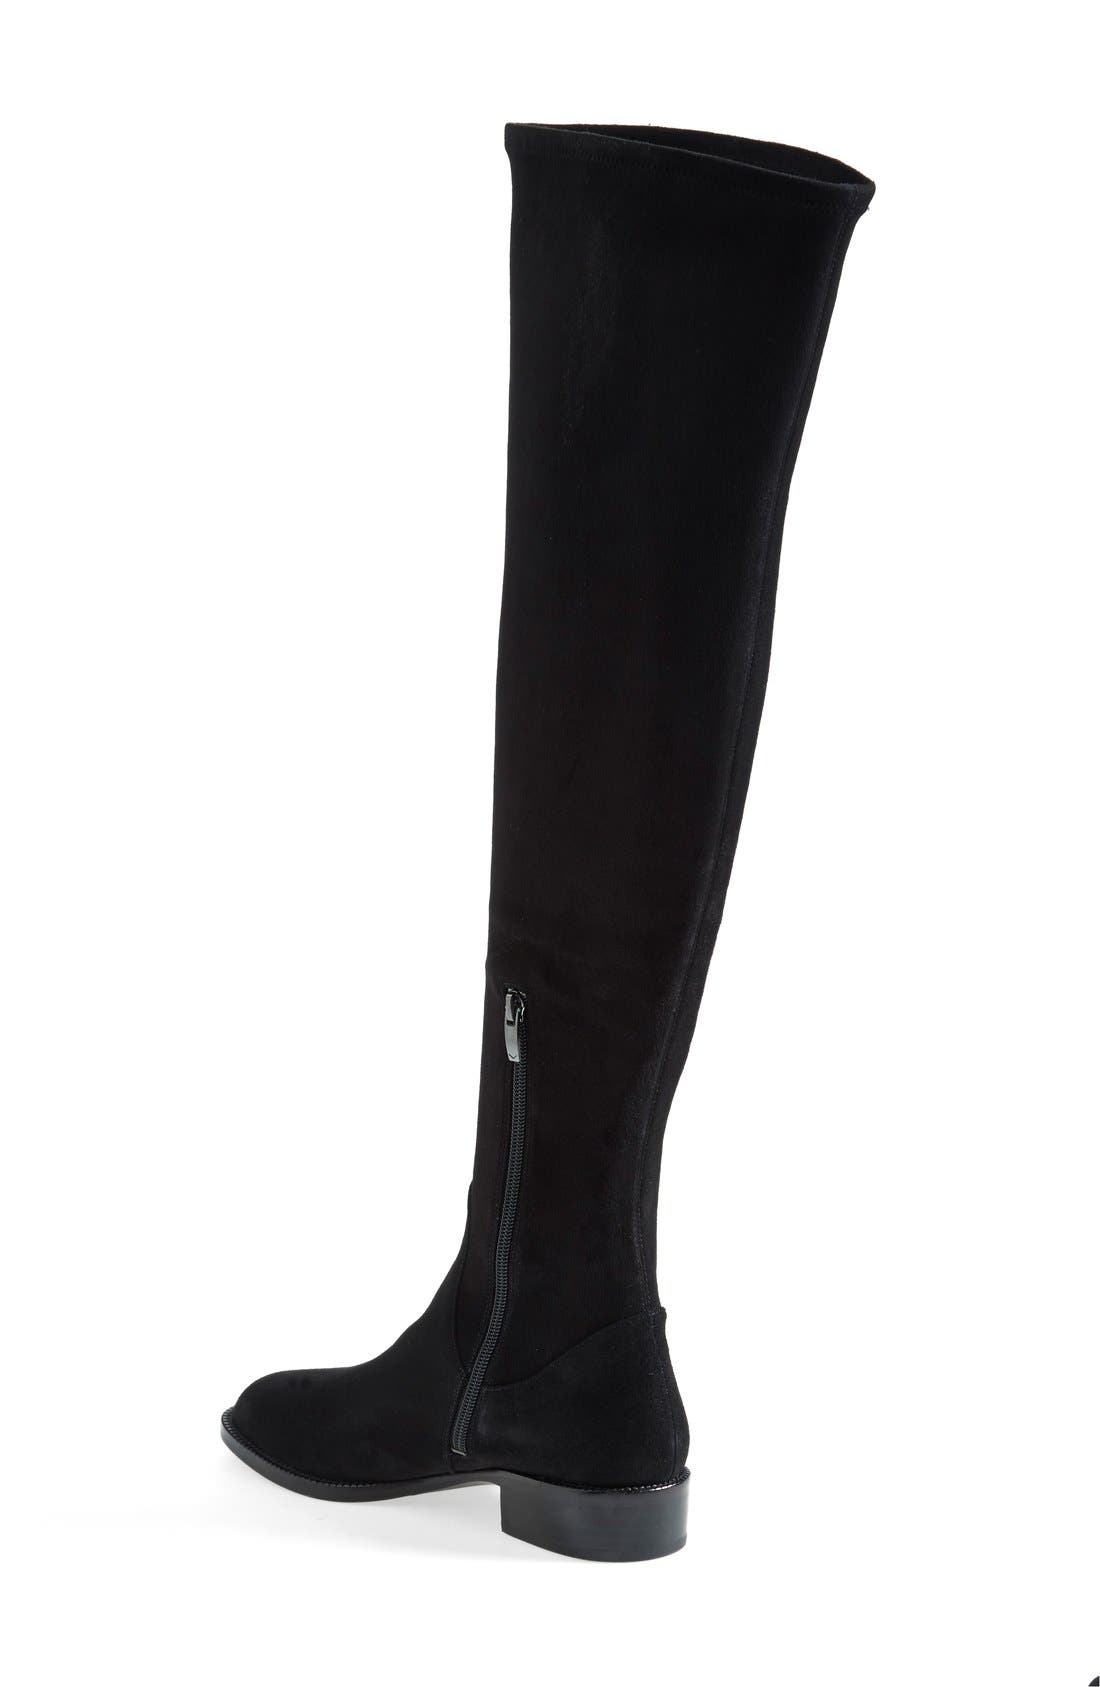 Alternate Image 2  - Via Spiga 'Boni' Over the Knee Boot (Women)